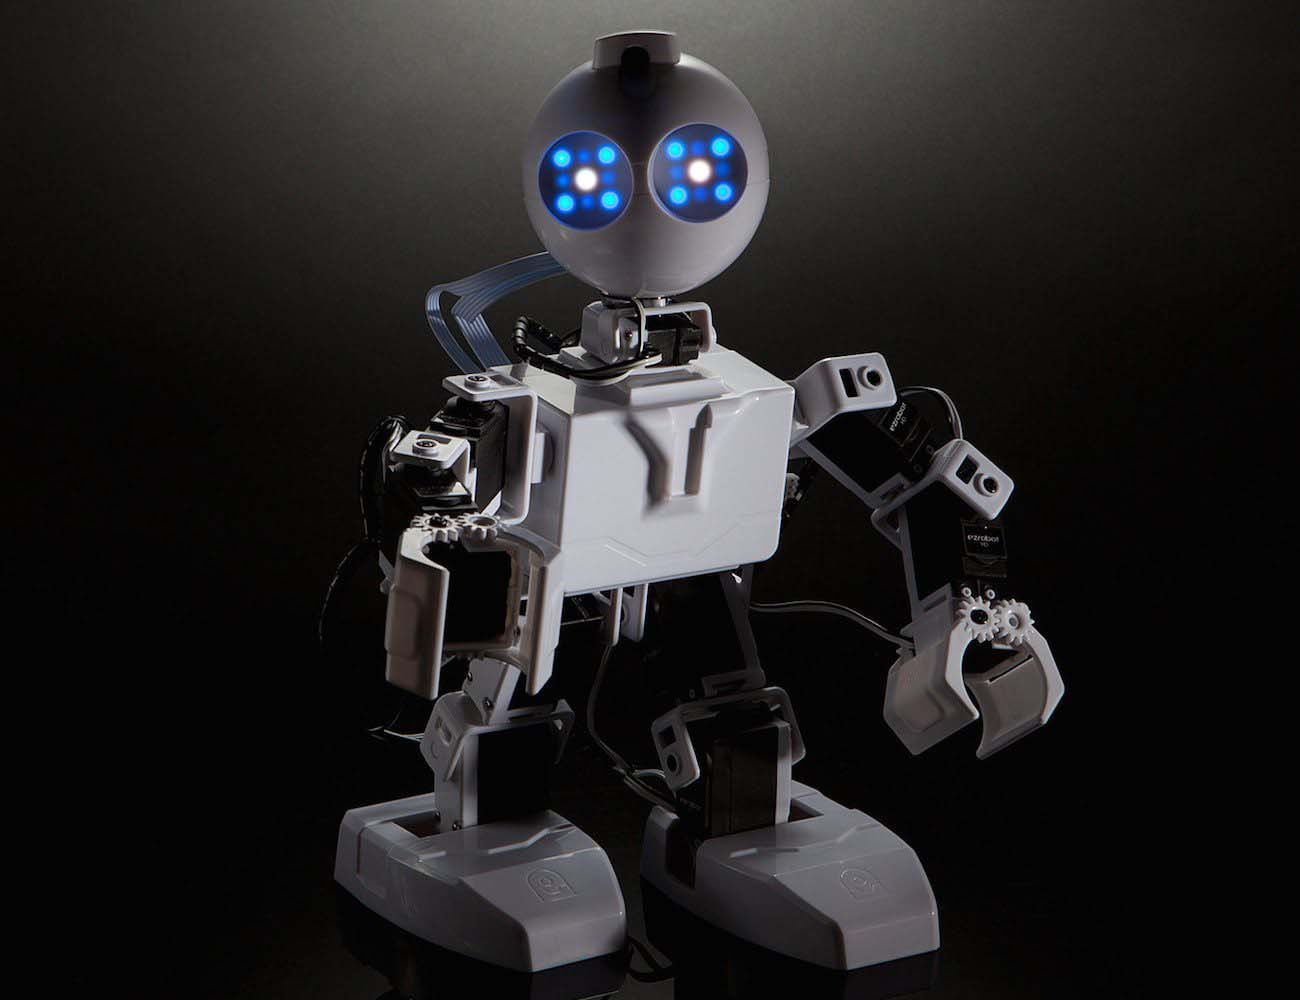 JD Humanoid – Revolutionary Robot Kit